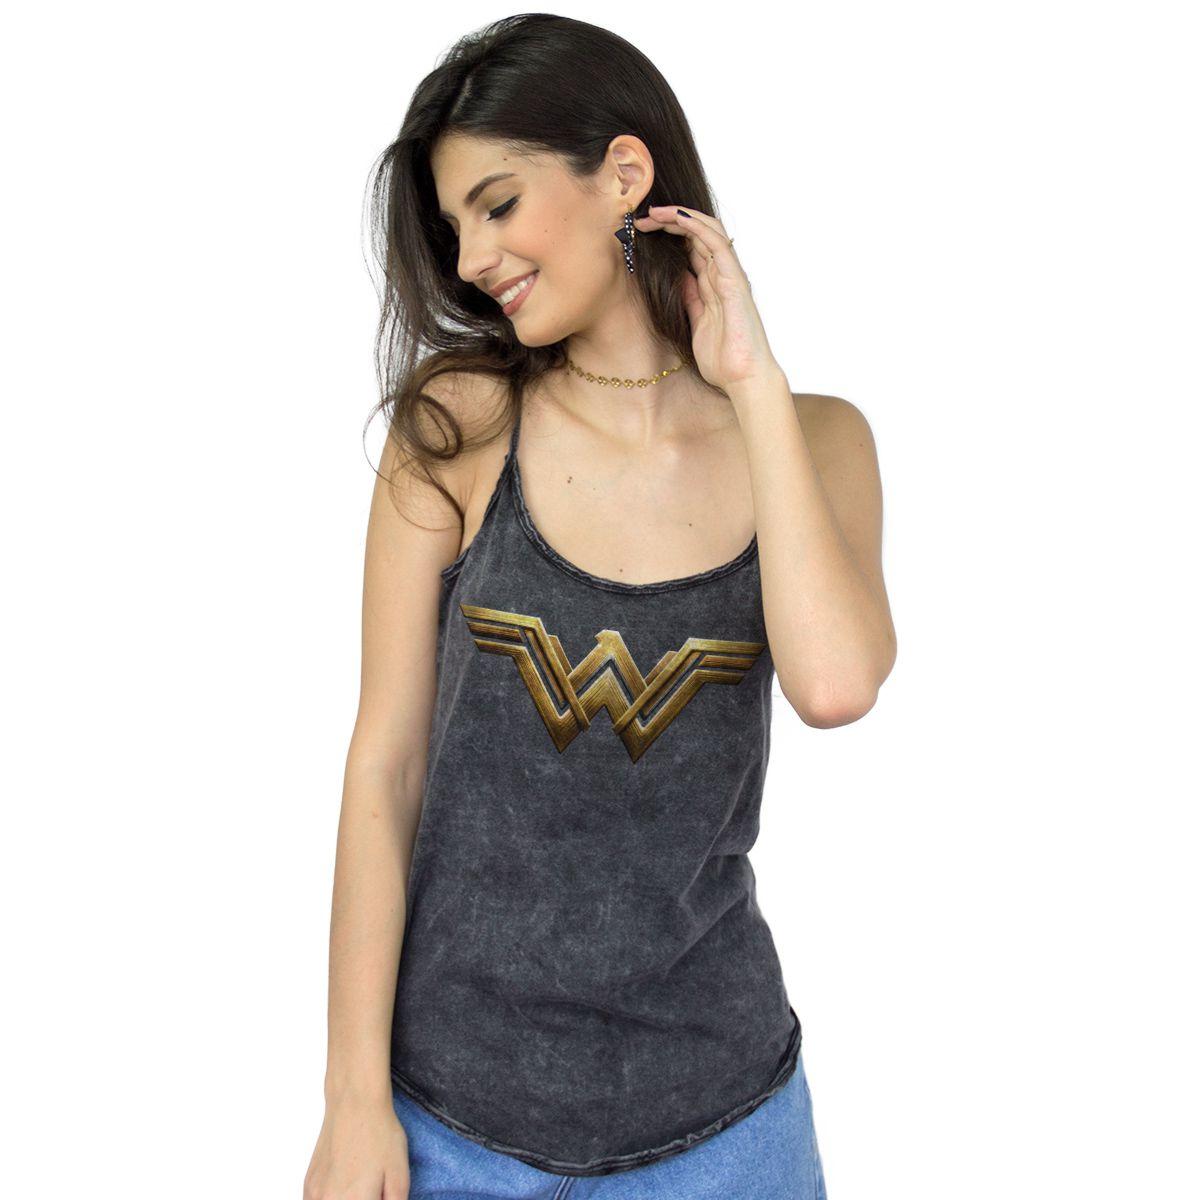 Regatinha Feminina Wonder Woman Logo Strenght  - bandUP Store Marketplace